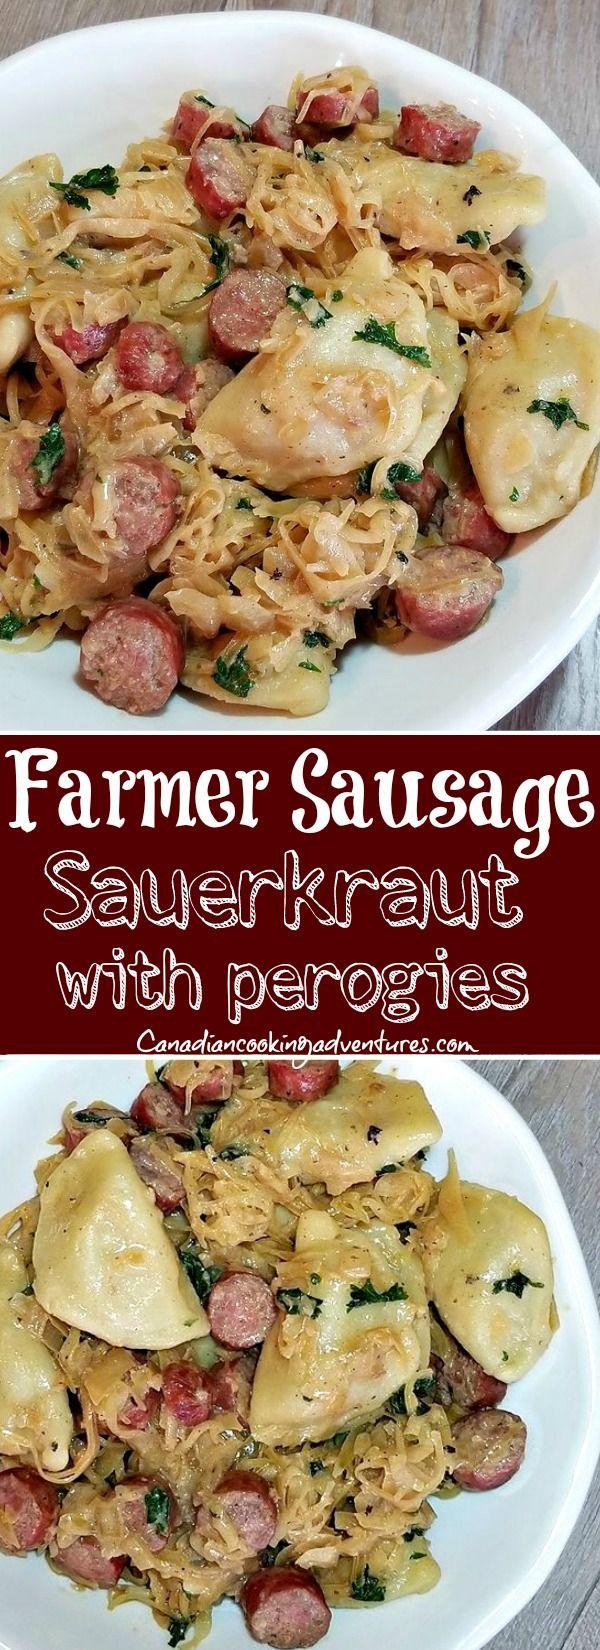 Farmer Sausage Skillet with Perogies